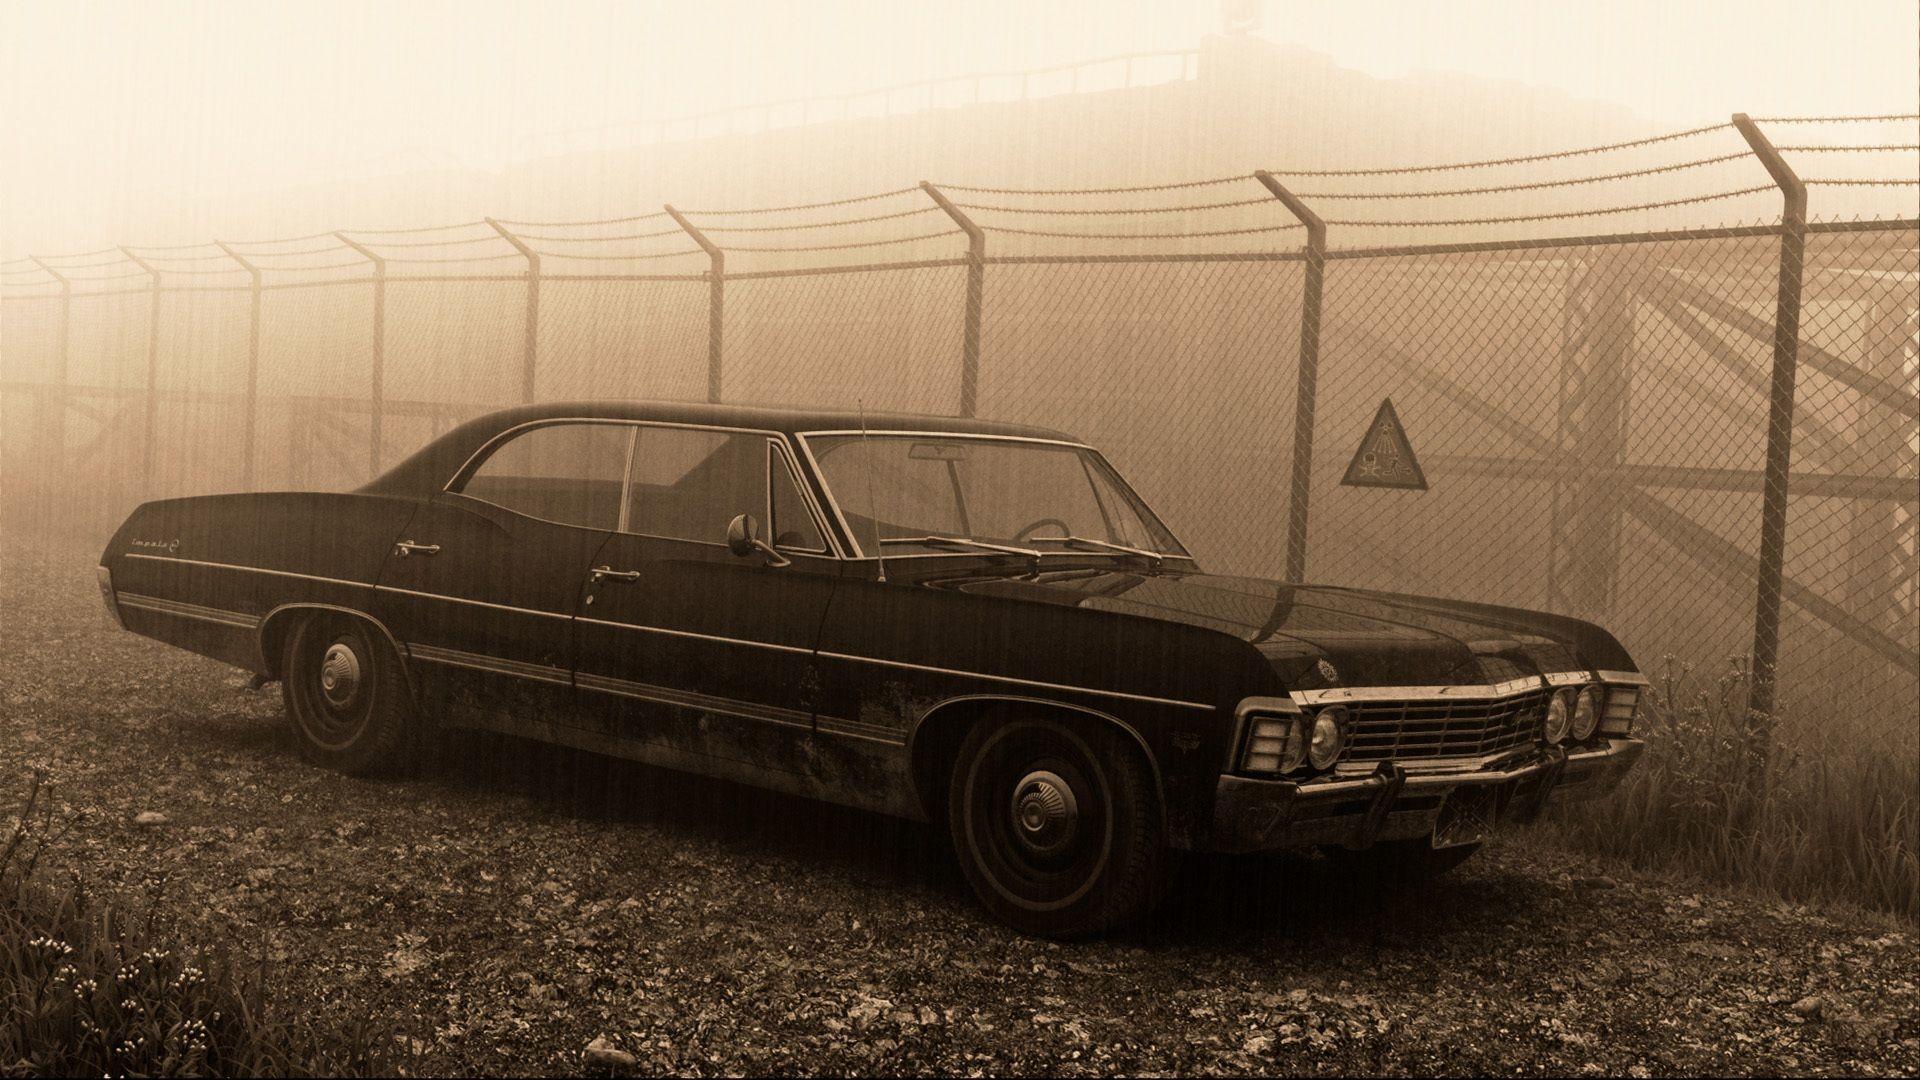 67 Impala Supernatural Wallpaper …